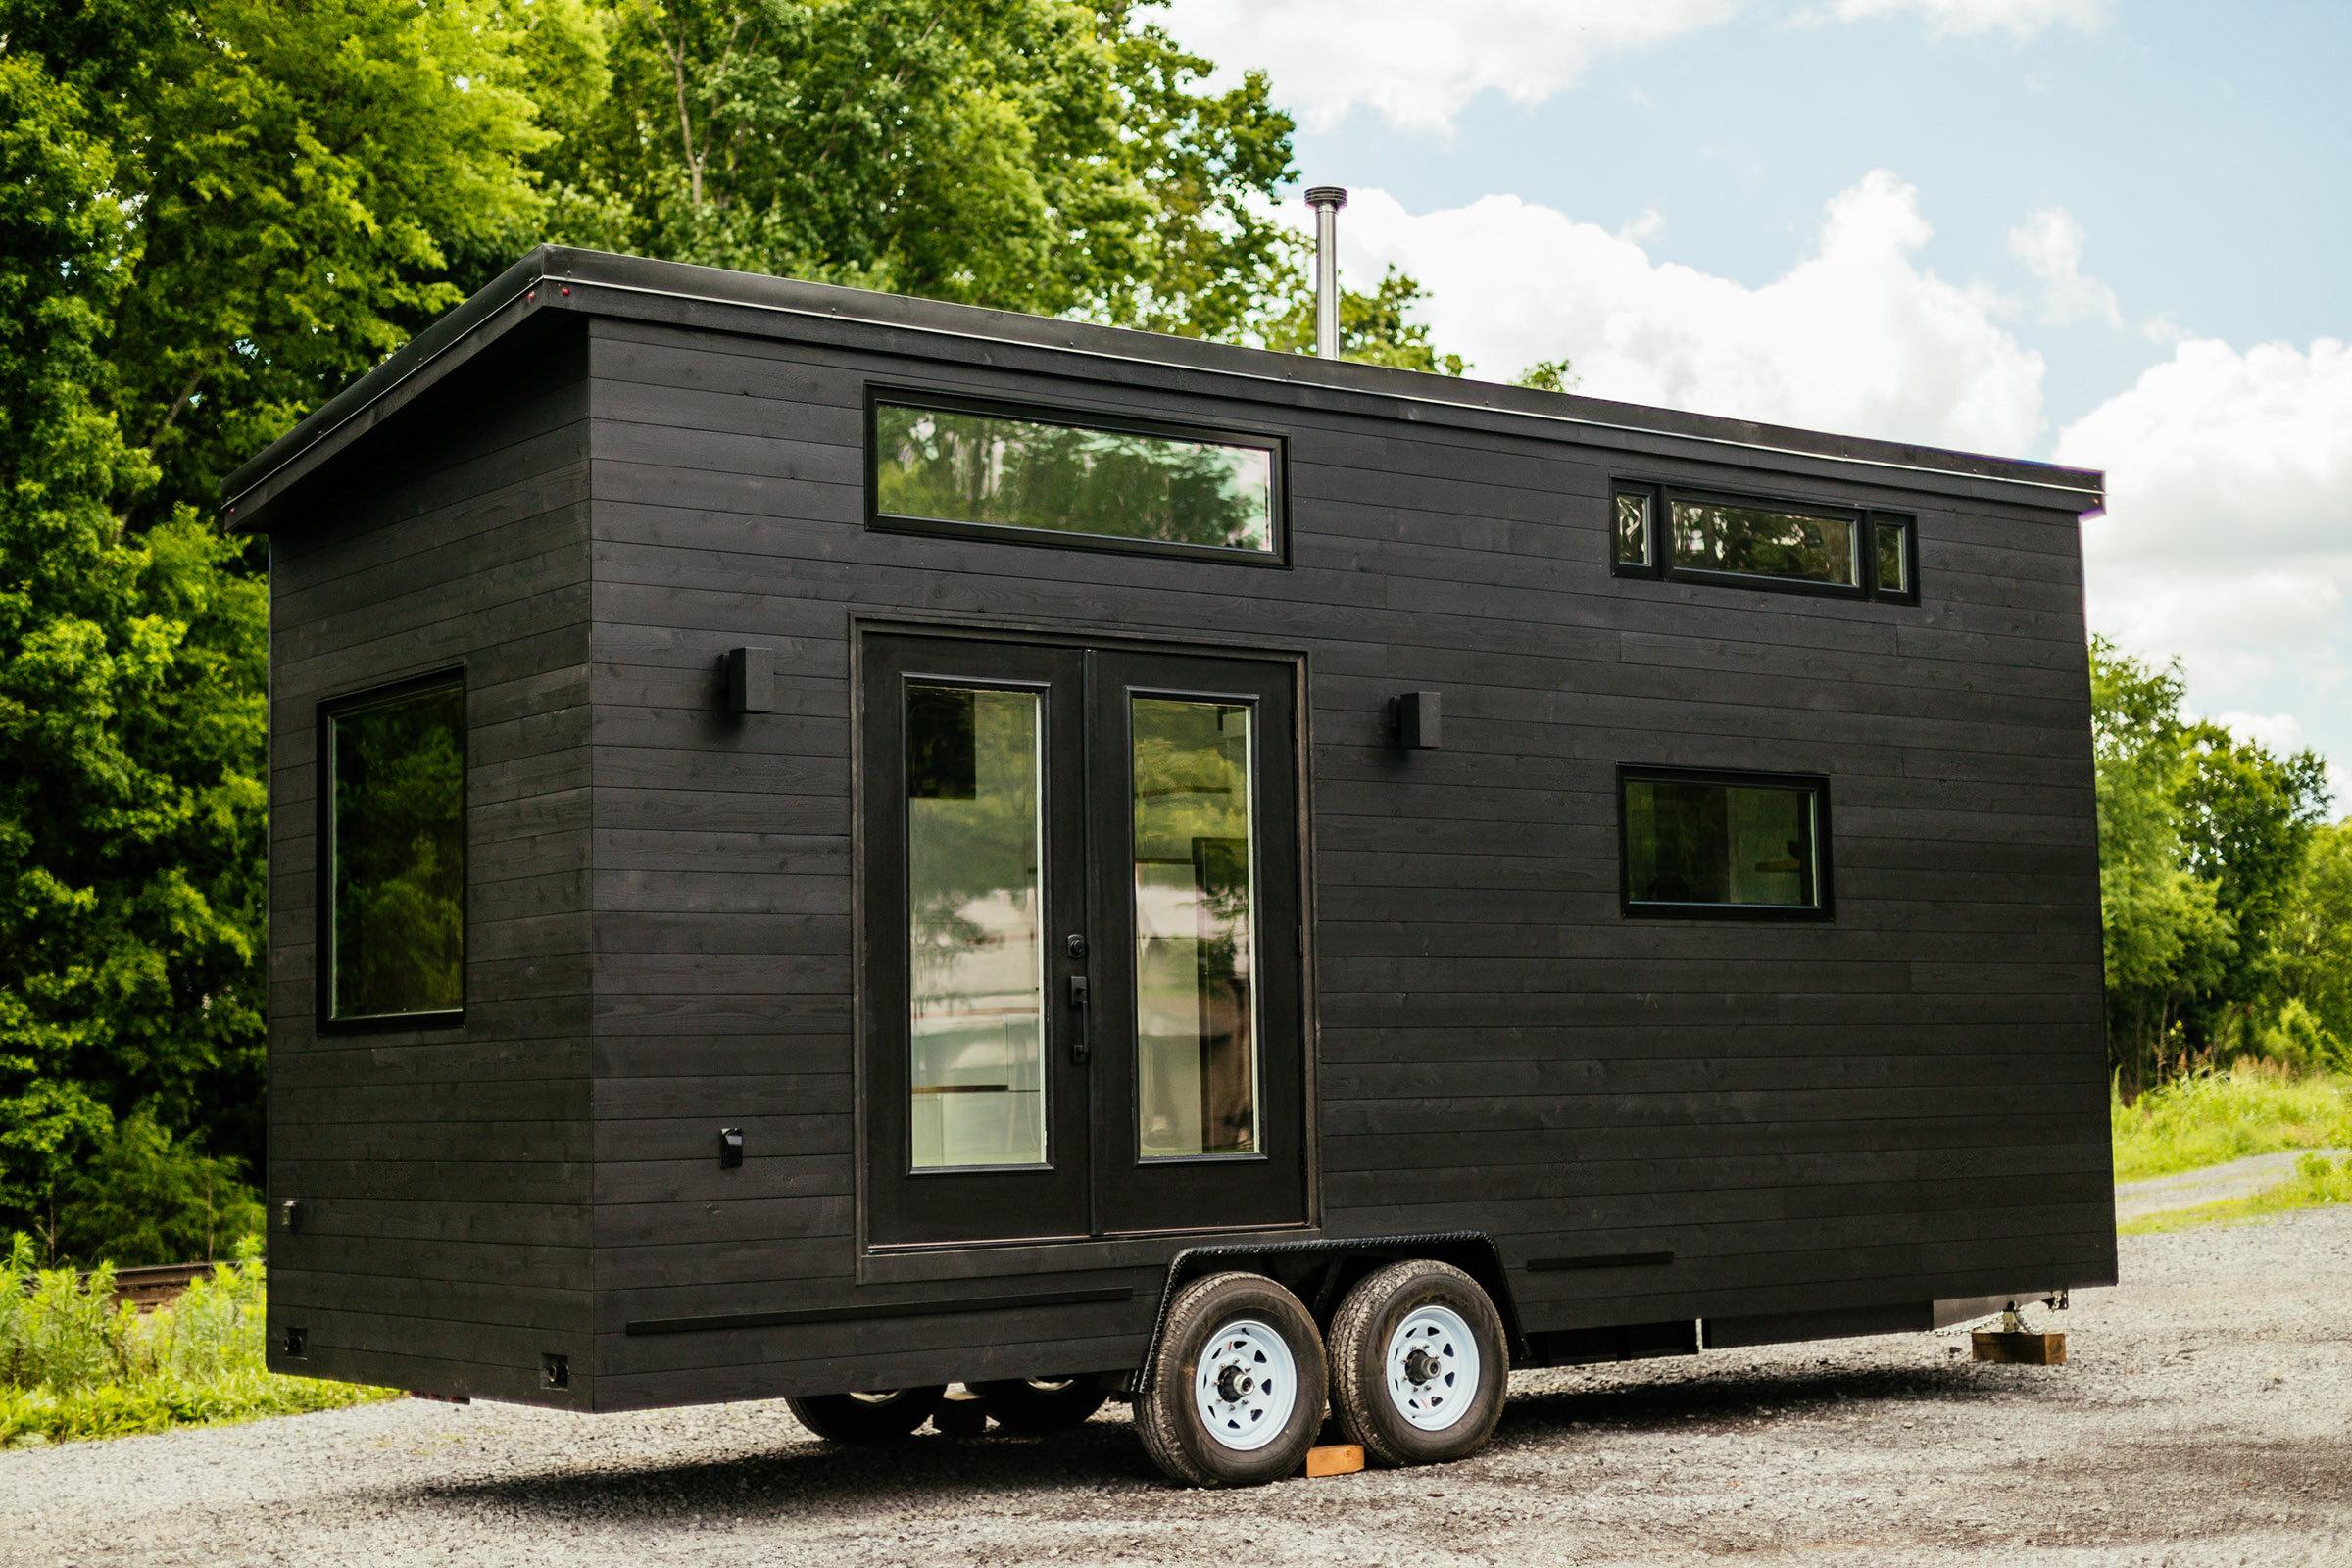 The Kubrick by Wind River Tiny Homes, a modern minimalist tiny house